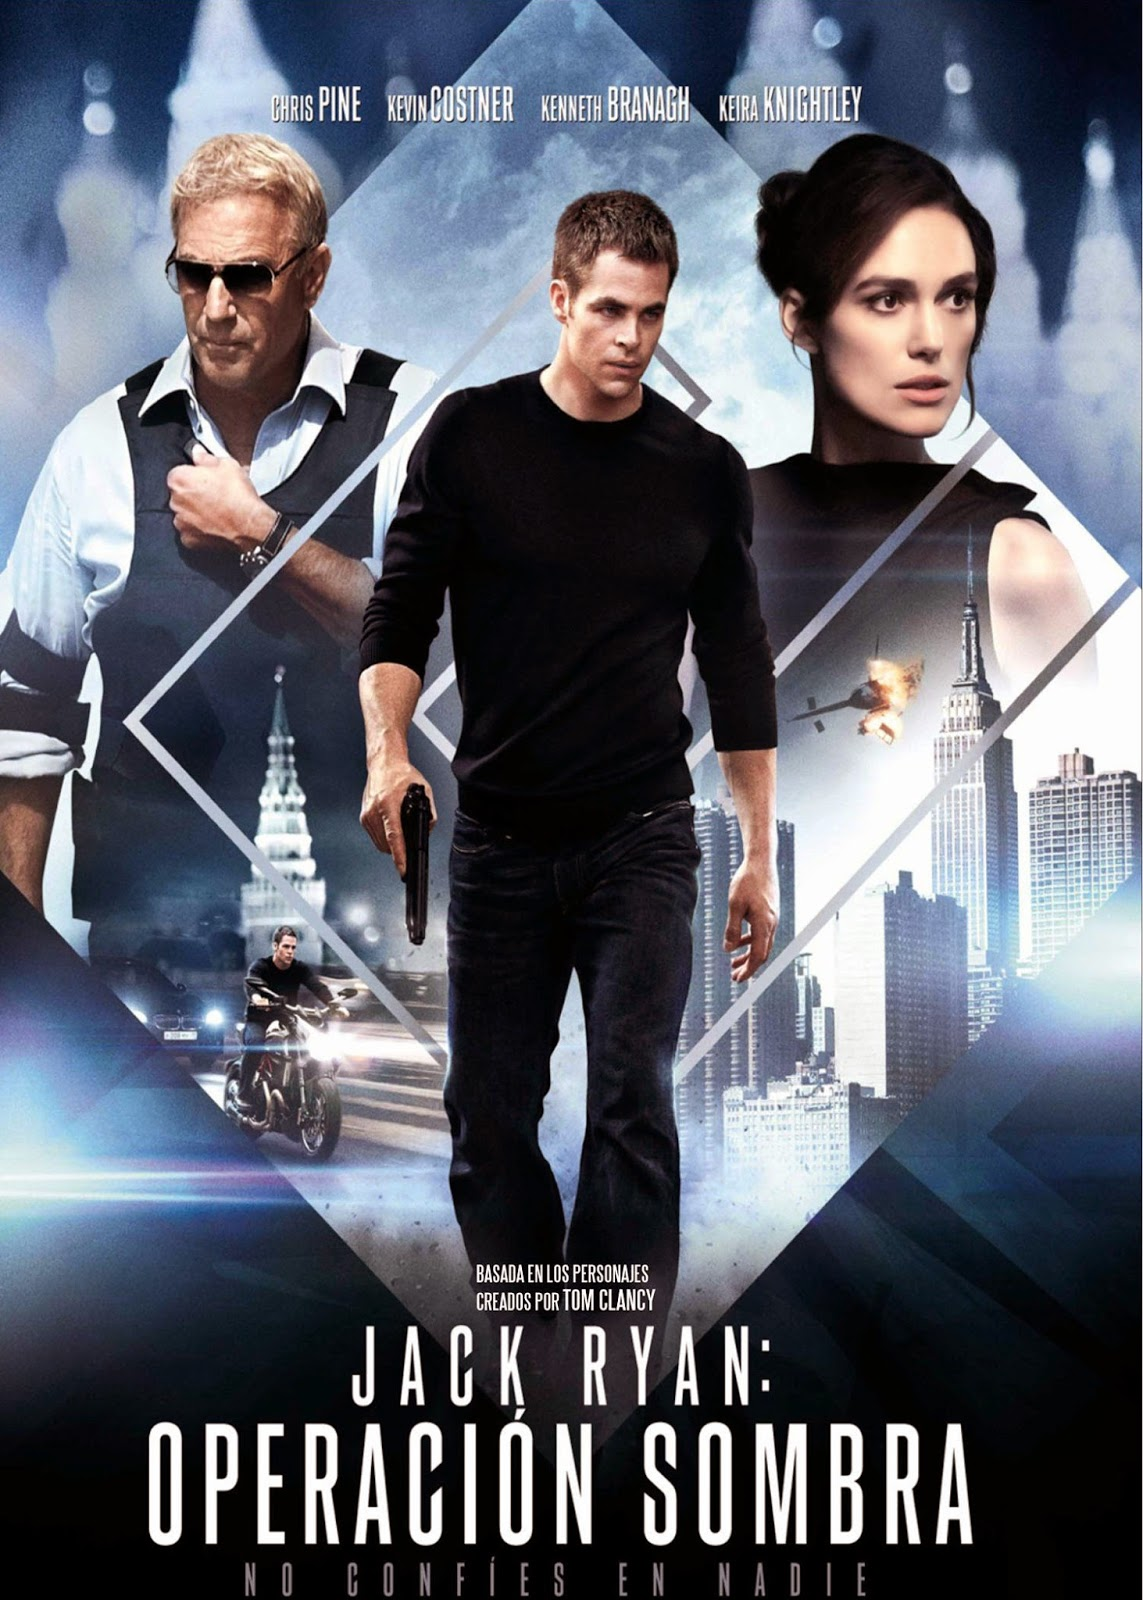 Jack Ryan: Operacion Sombra (2013)